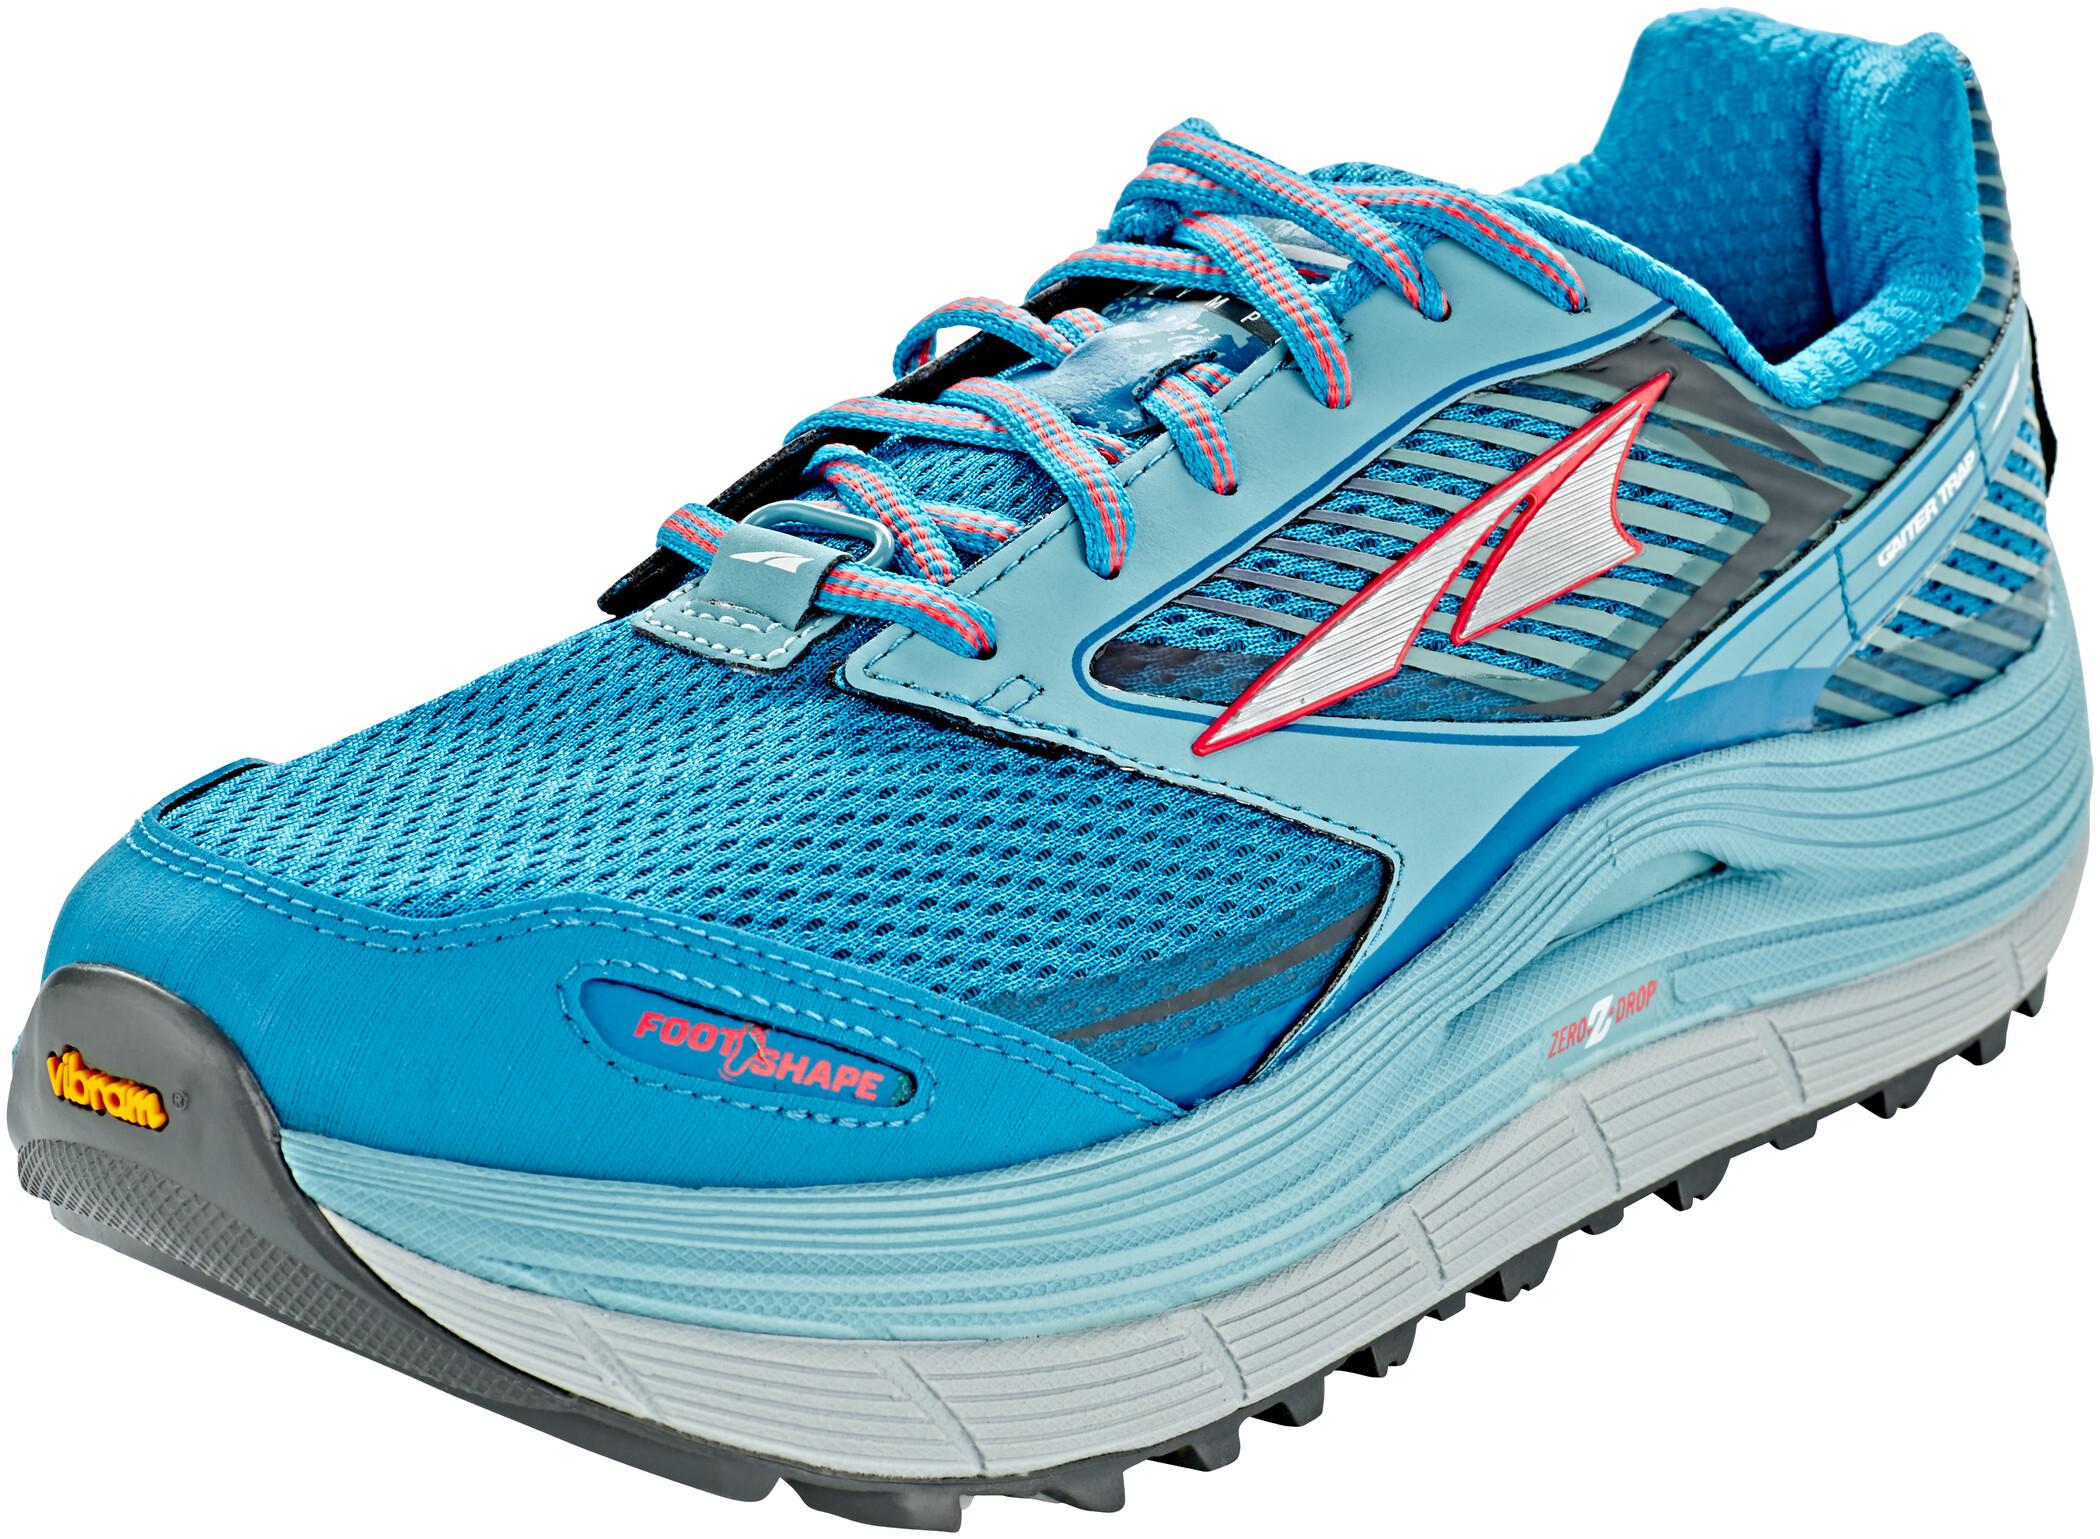 Altra Olympus 2.5 Løbesko Damer, blue | Running shoes